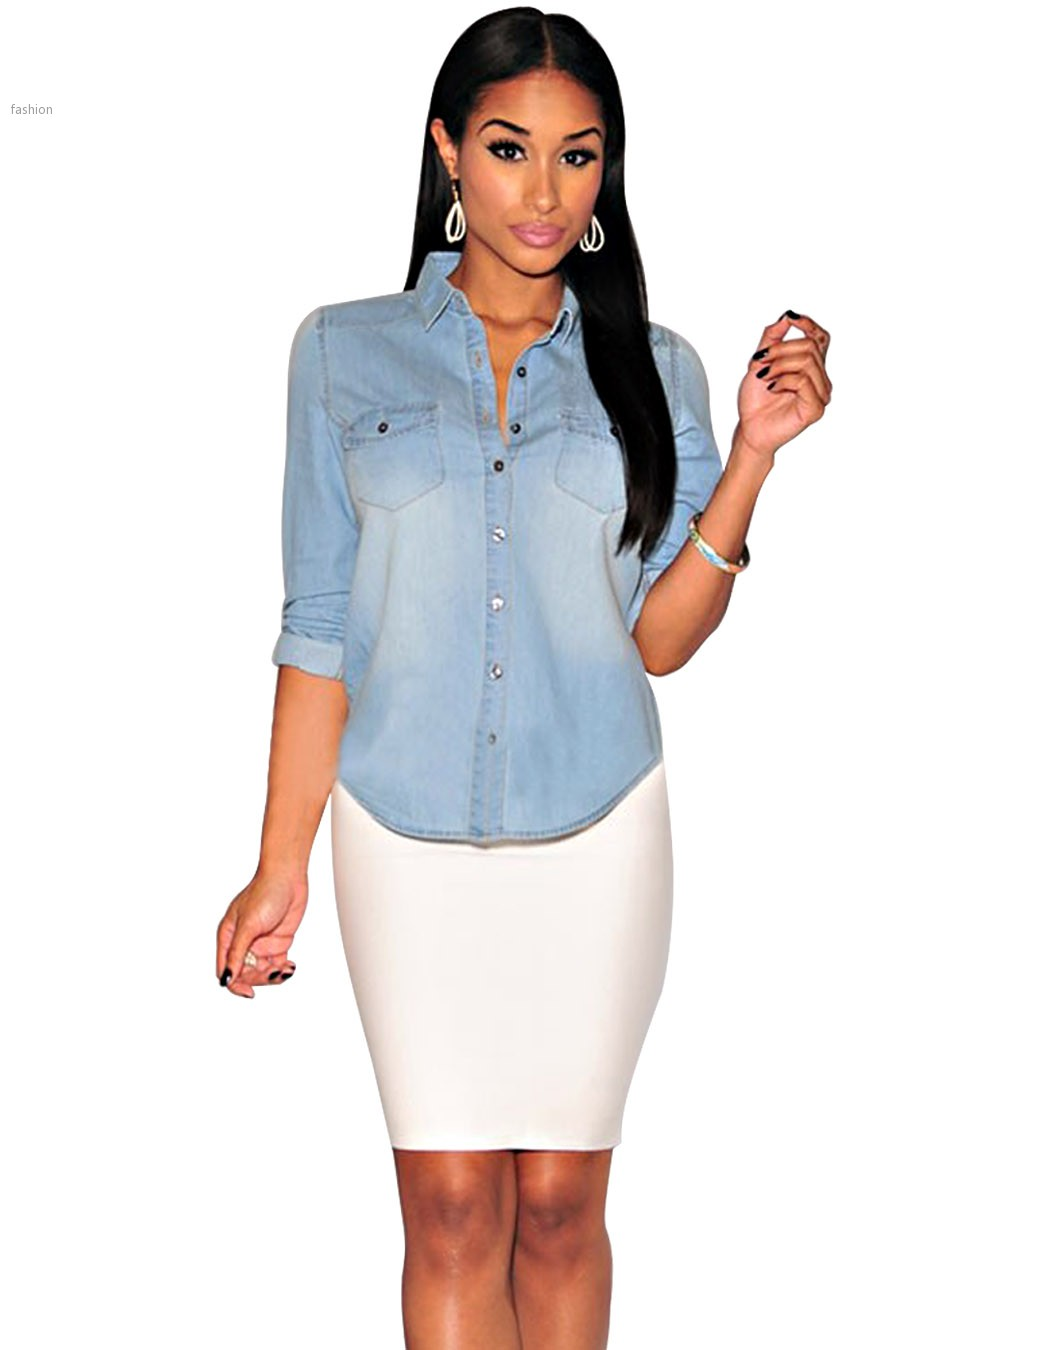 47910088ef7 2015 summer style blusas fashion clothing sexy club denim blouses long  sleeve women jeans shirt casual slim tops plus size 41